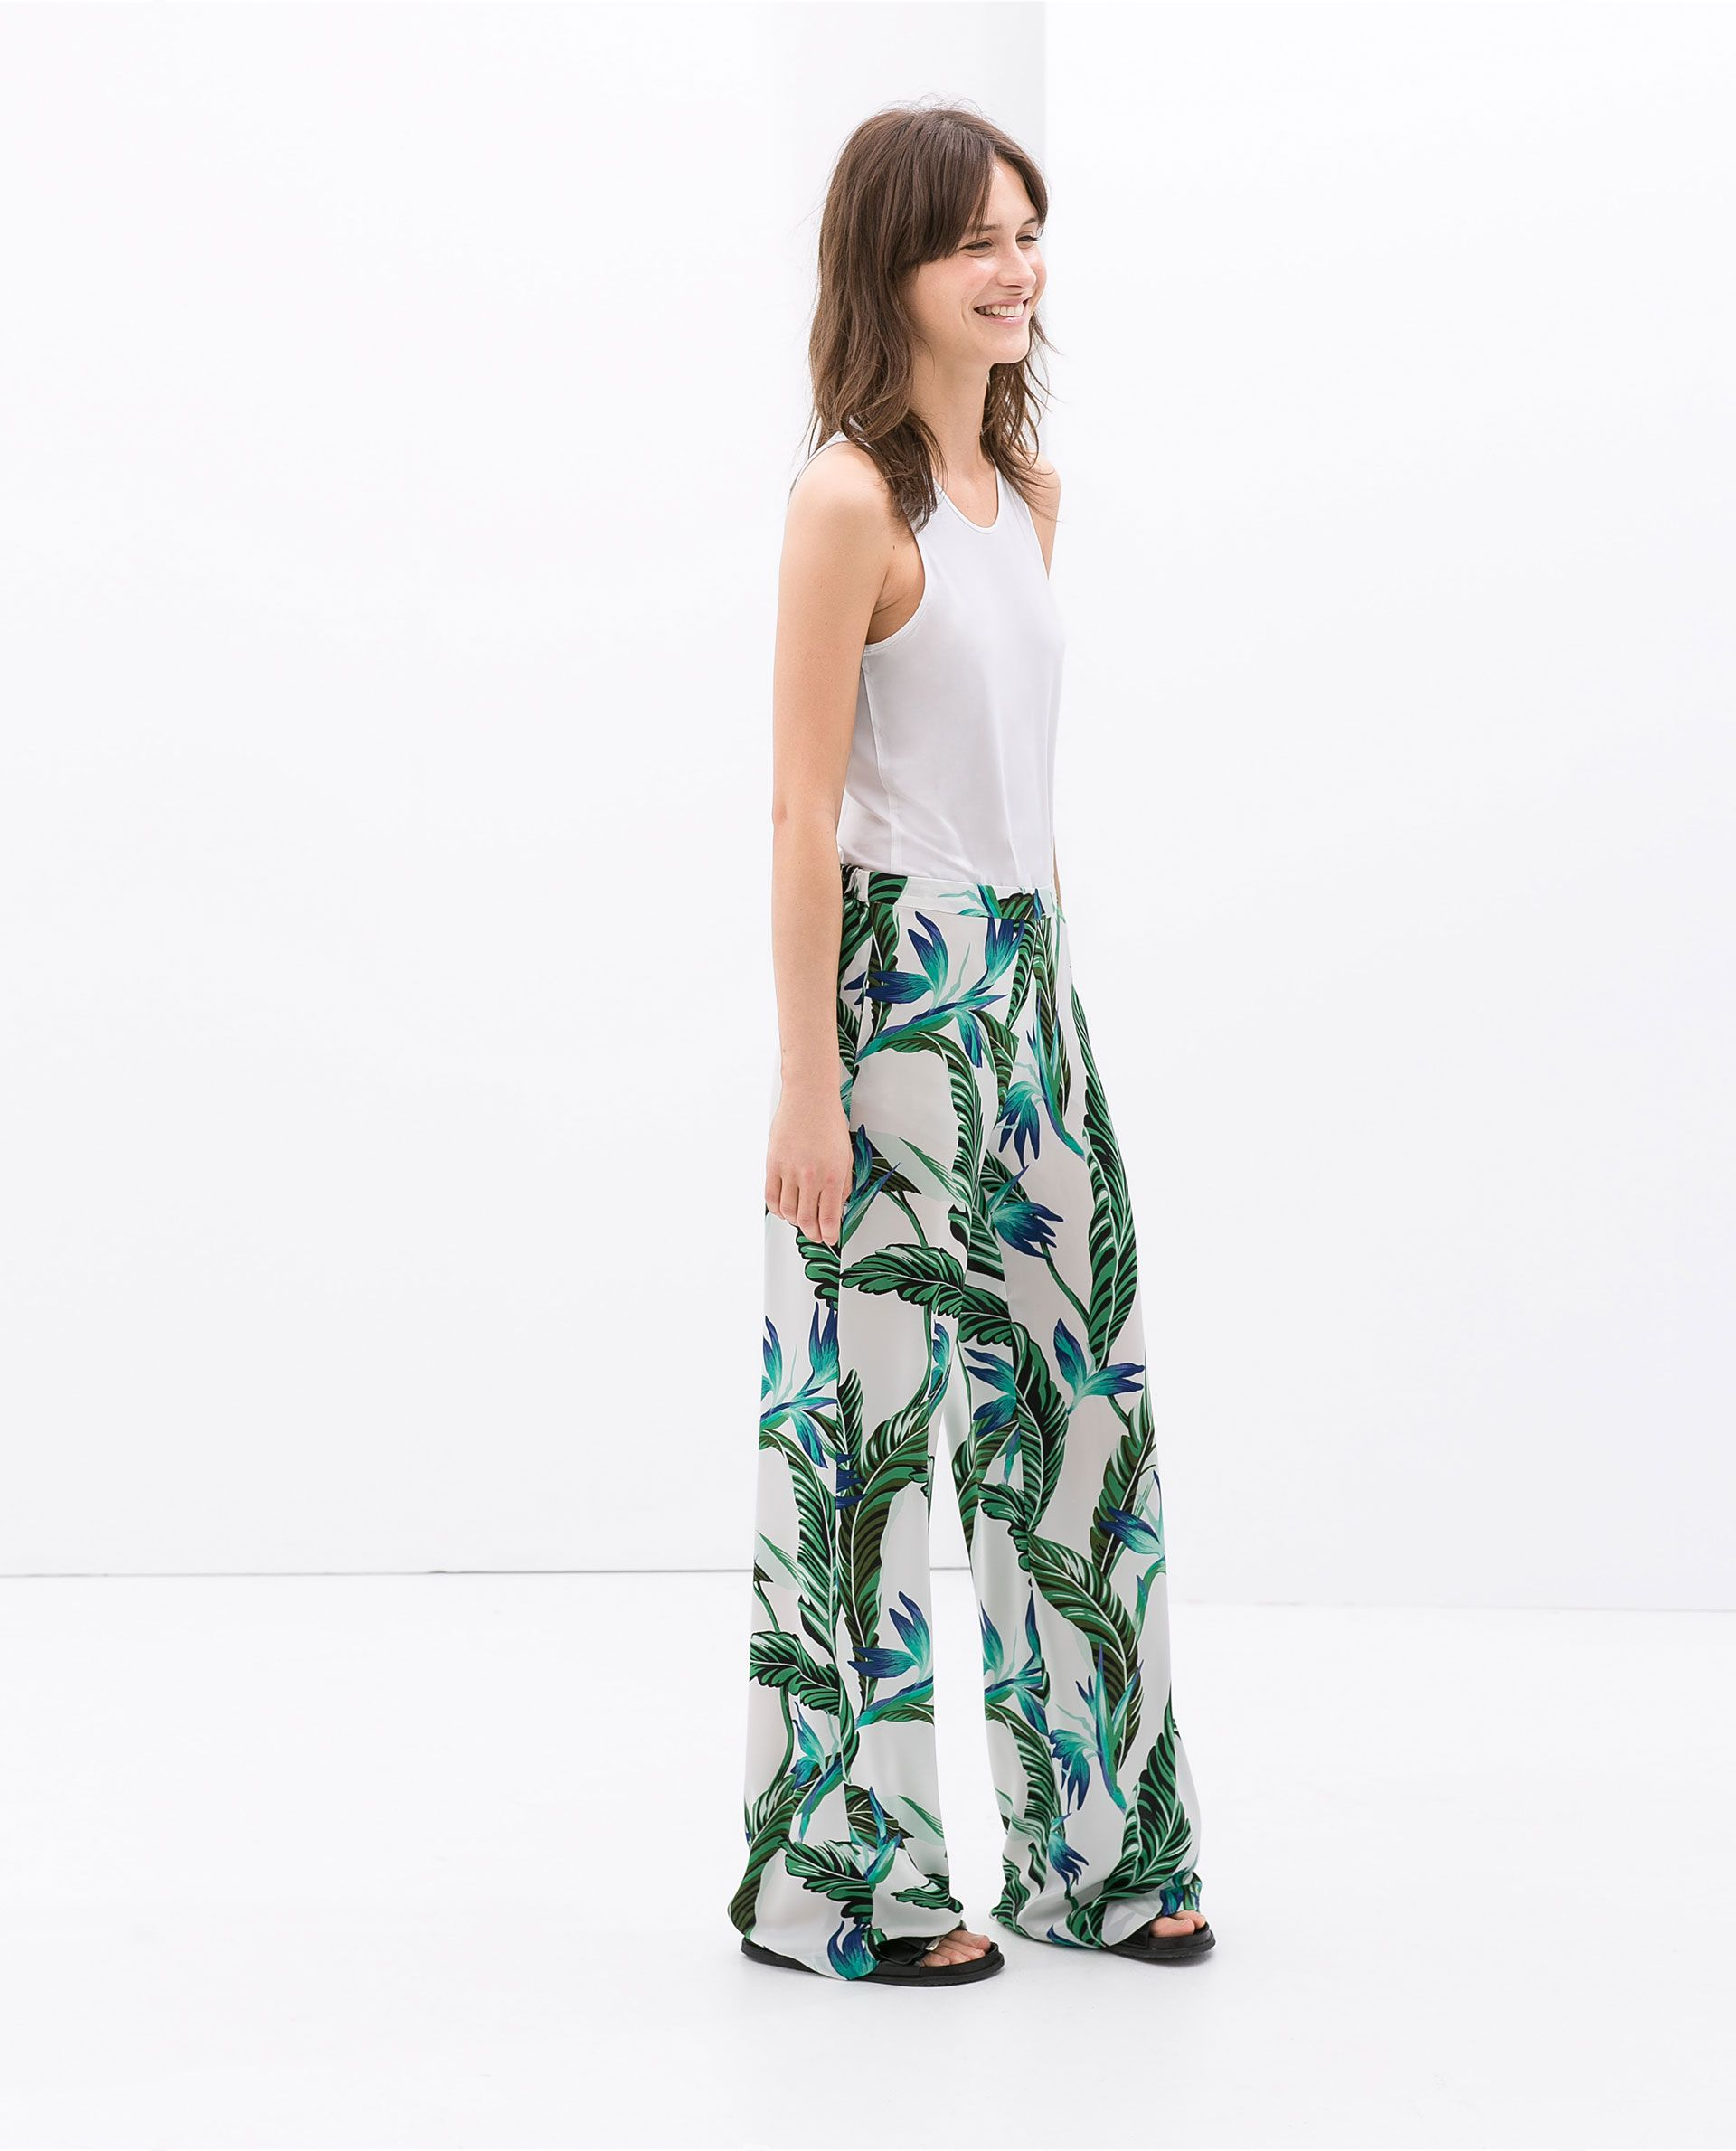 d169dfa7 ZARA - WOMAN - FLOWY WIDE TROUSERS WITH LEAF PRINT | What to Wear in ...